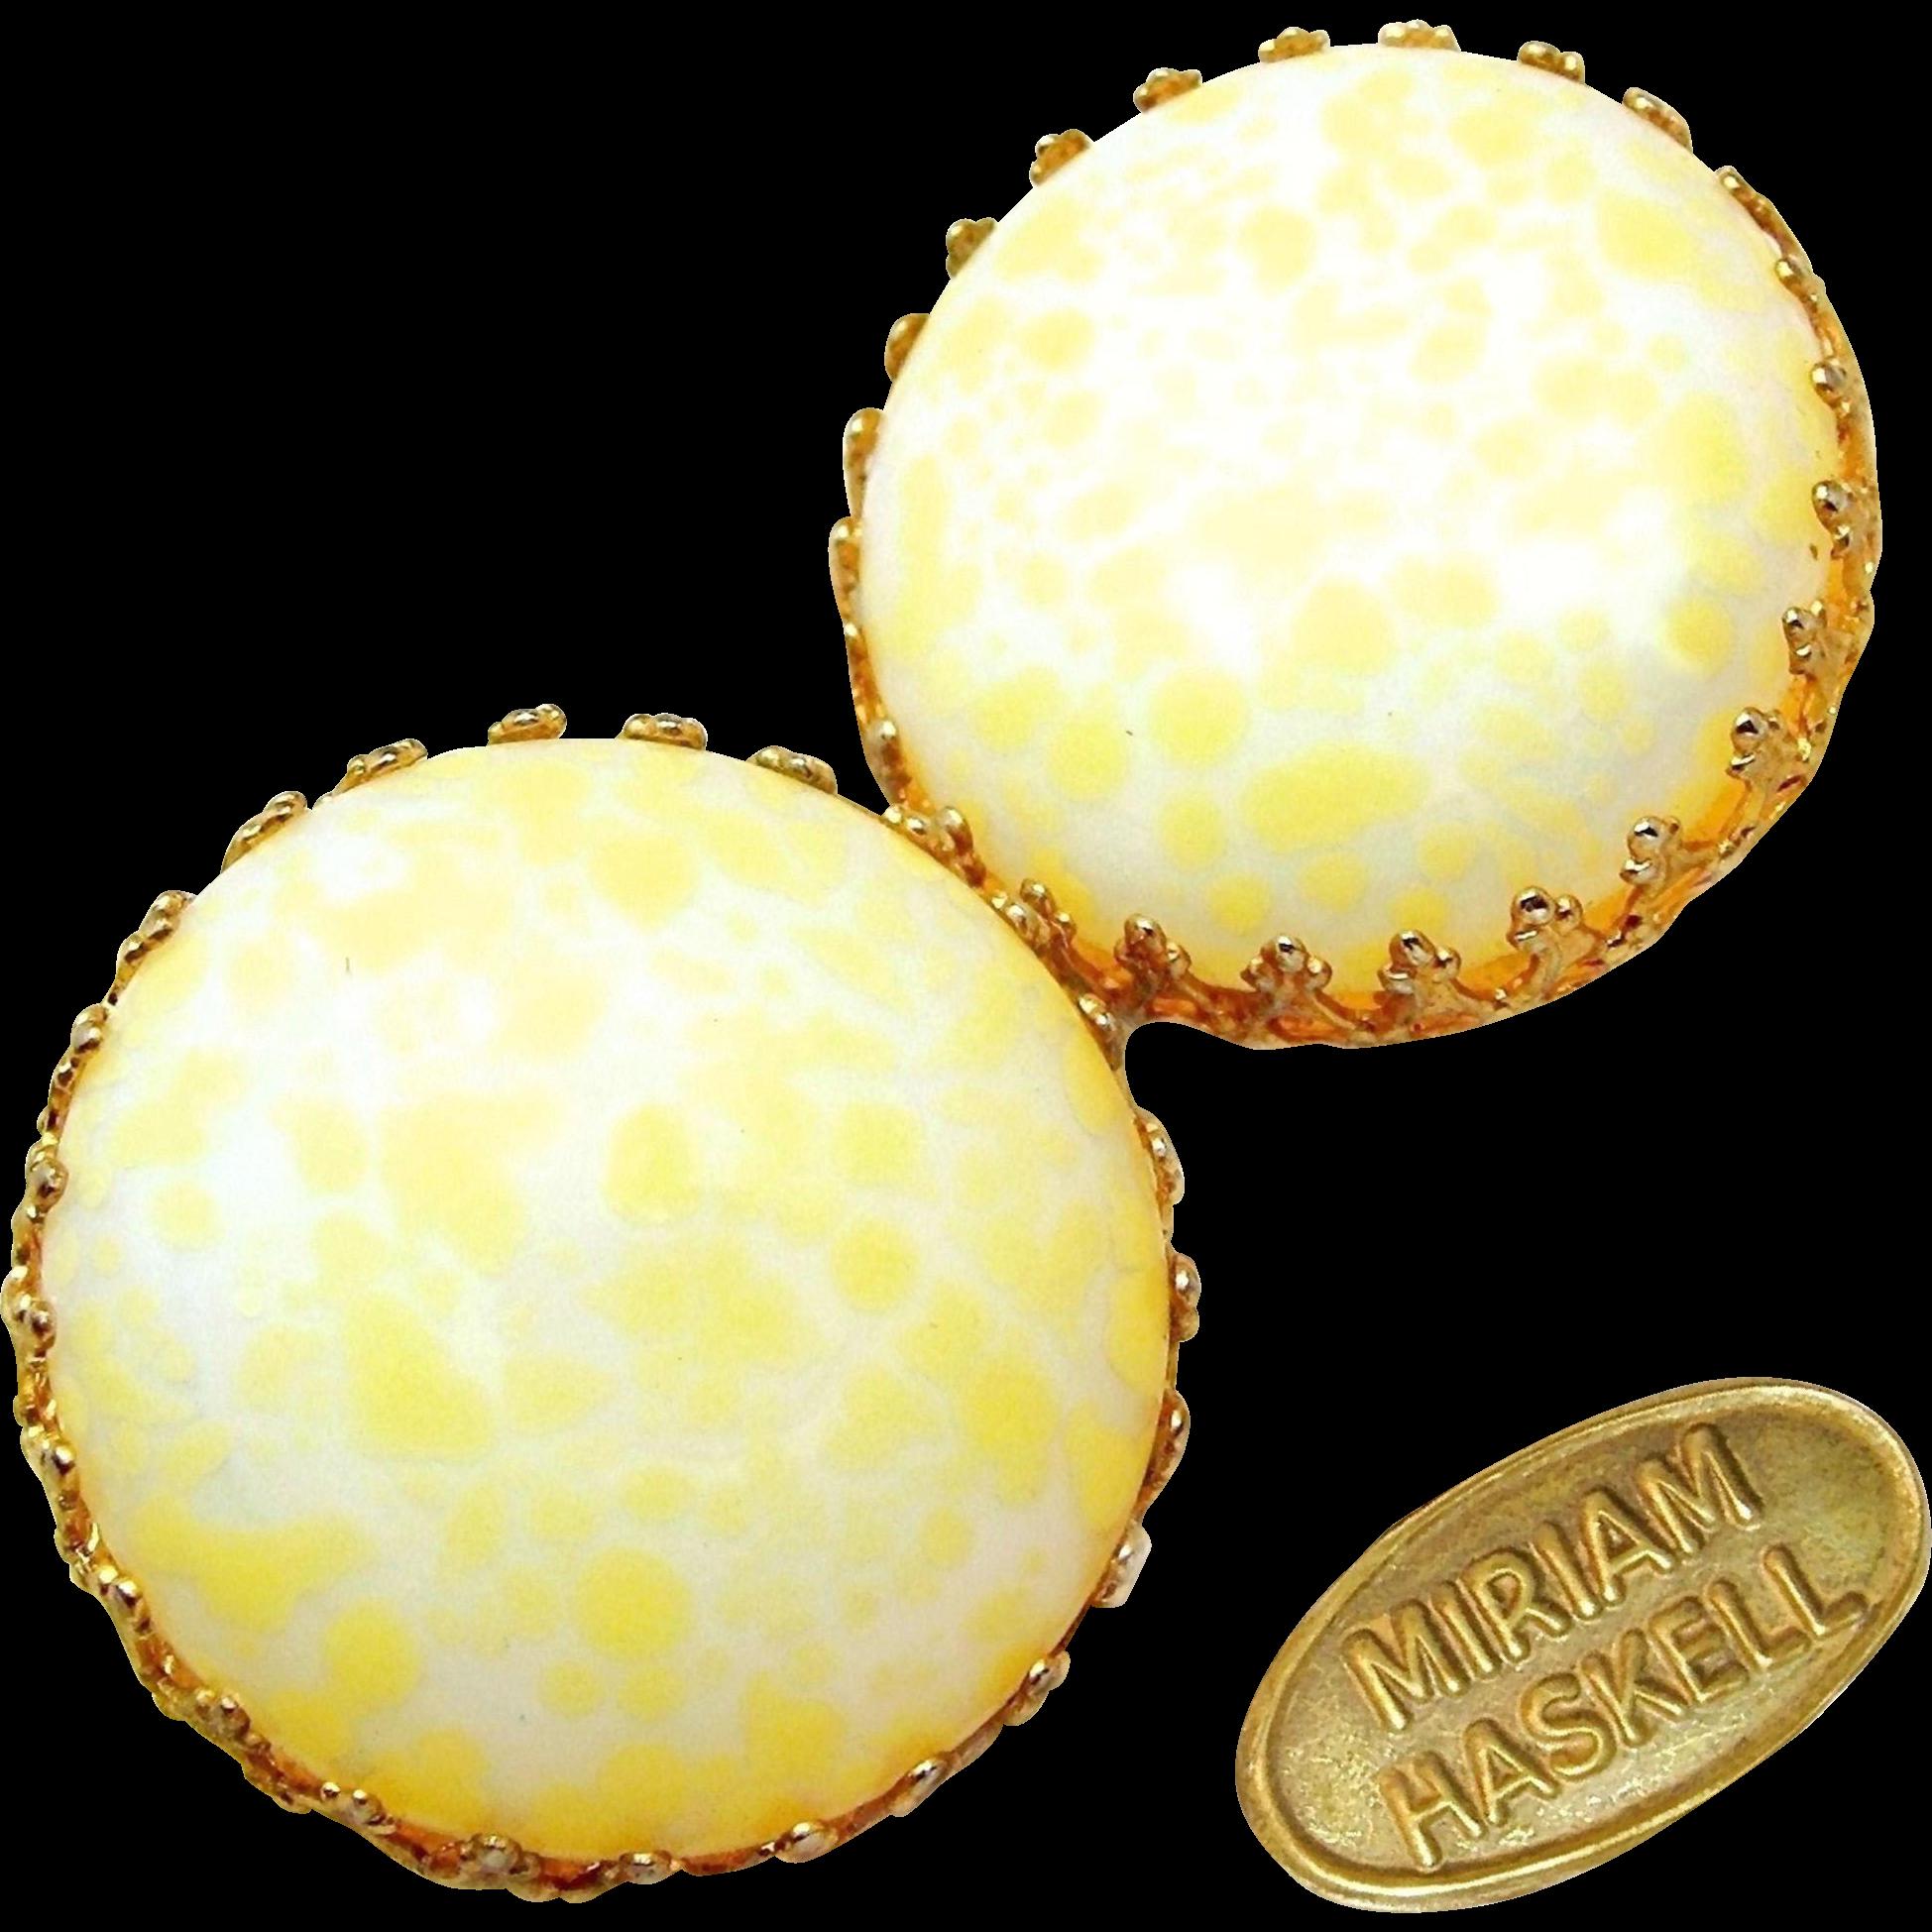 Vintage MIRIAM HASKELL Earrings w/ Elegant Pale Easter Egg Yellow Pate de Verre Glass